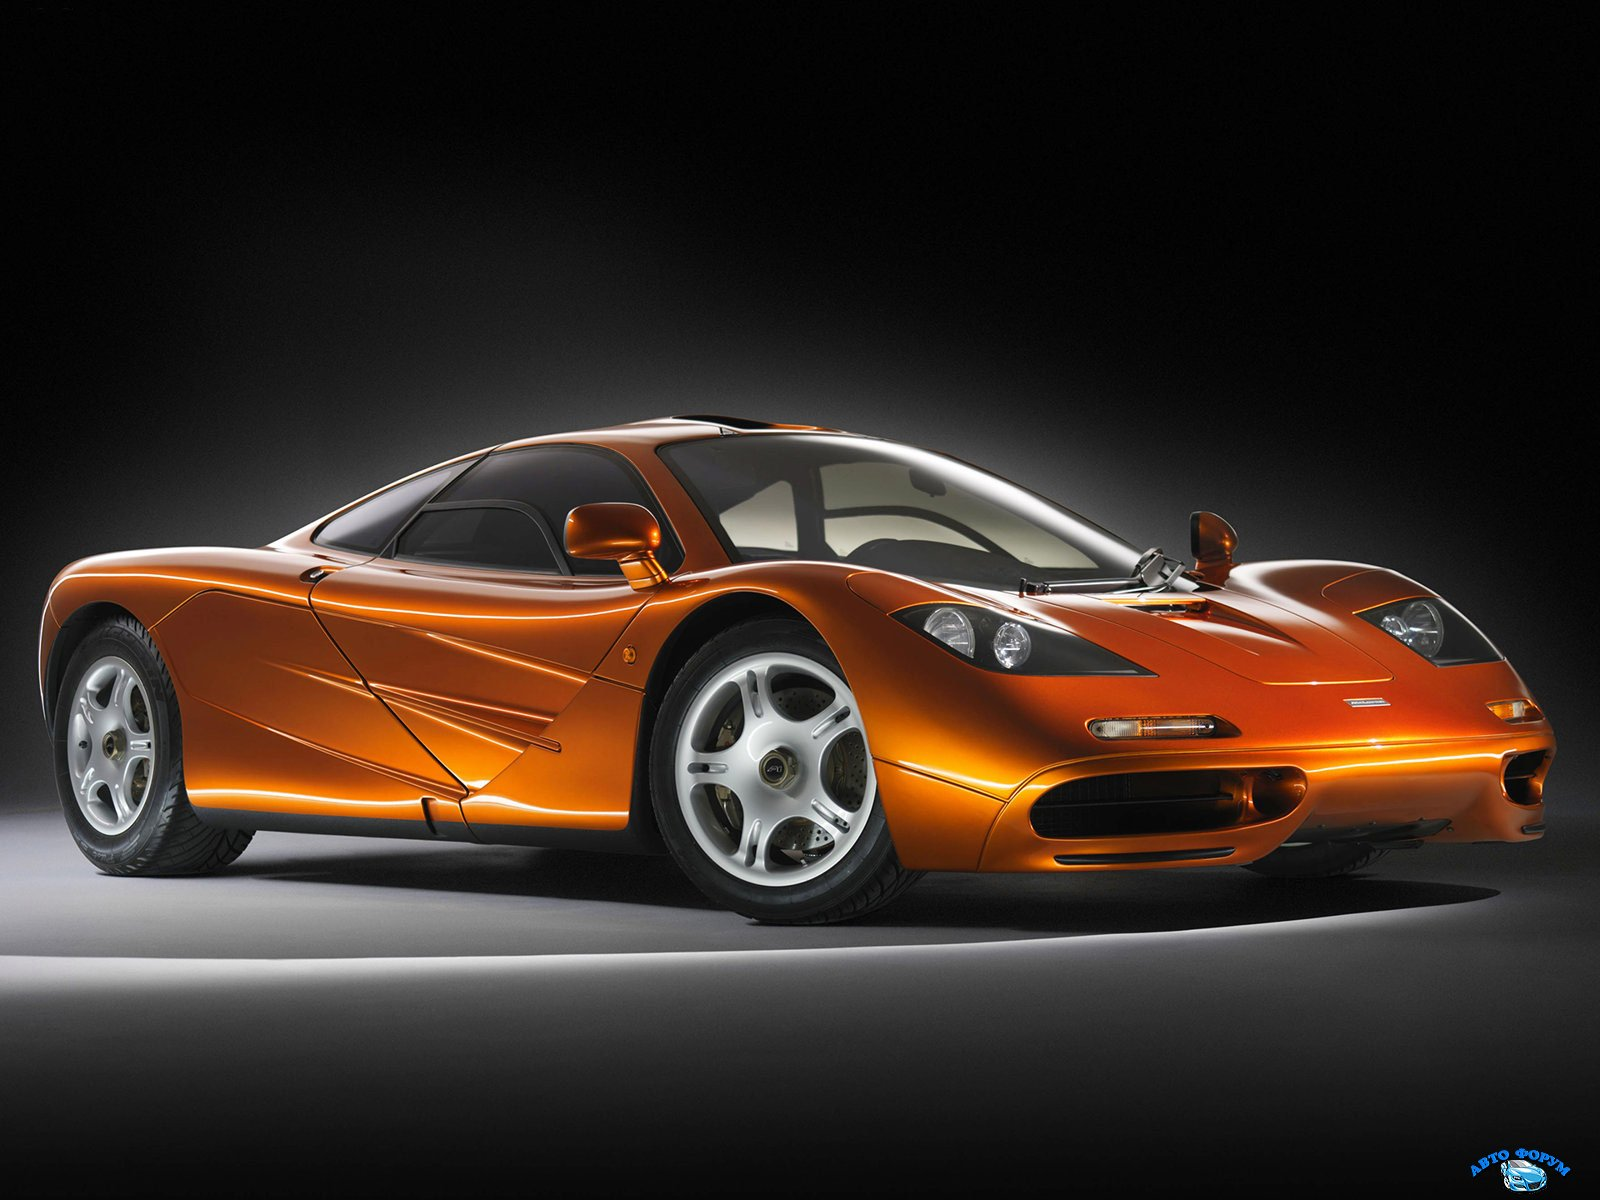 McLaren-F1_1993_1.jpg